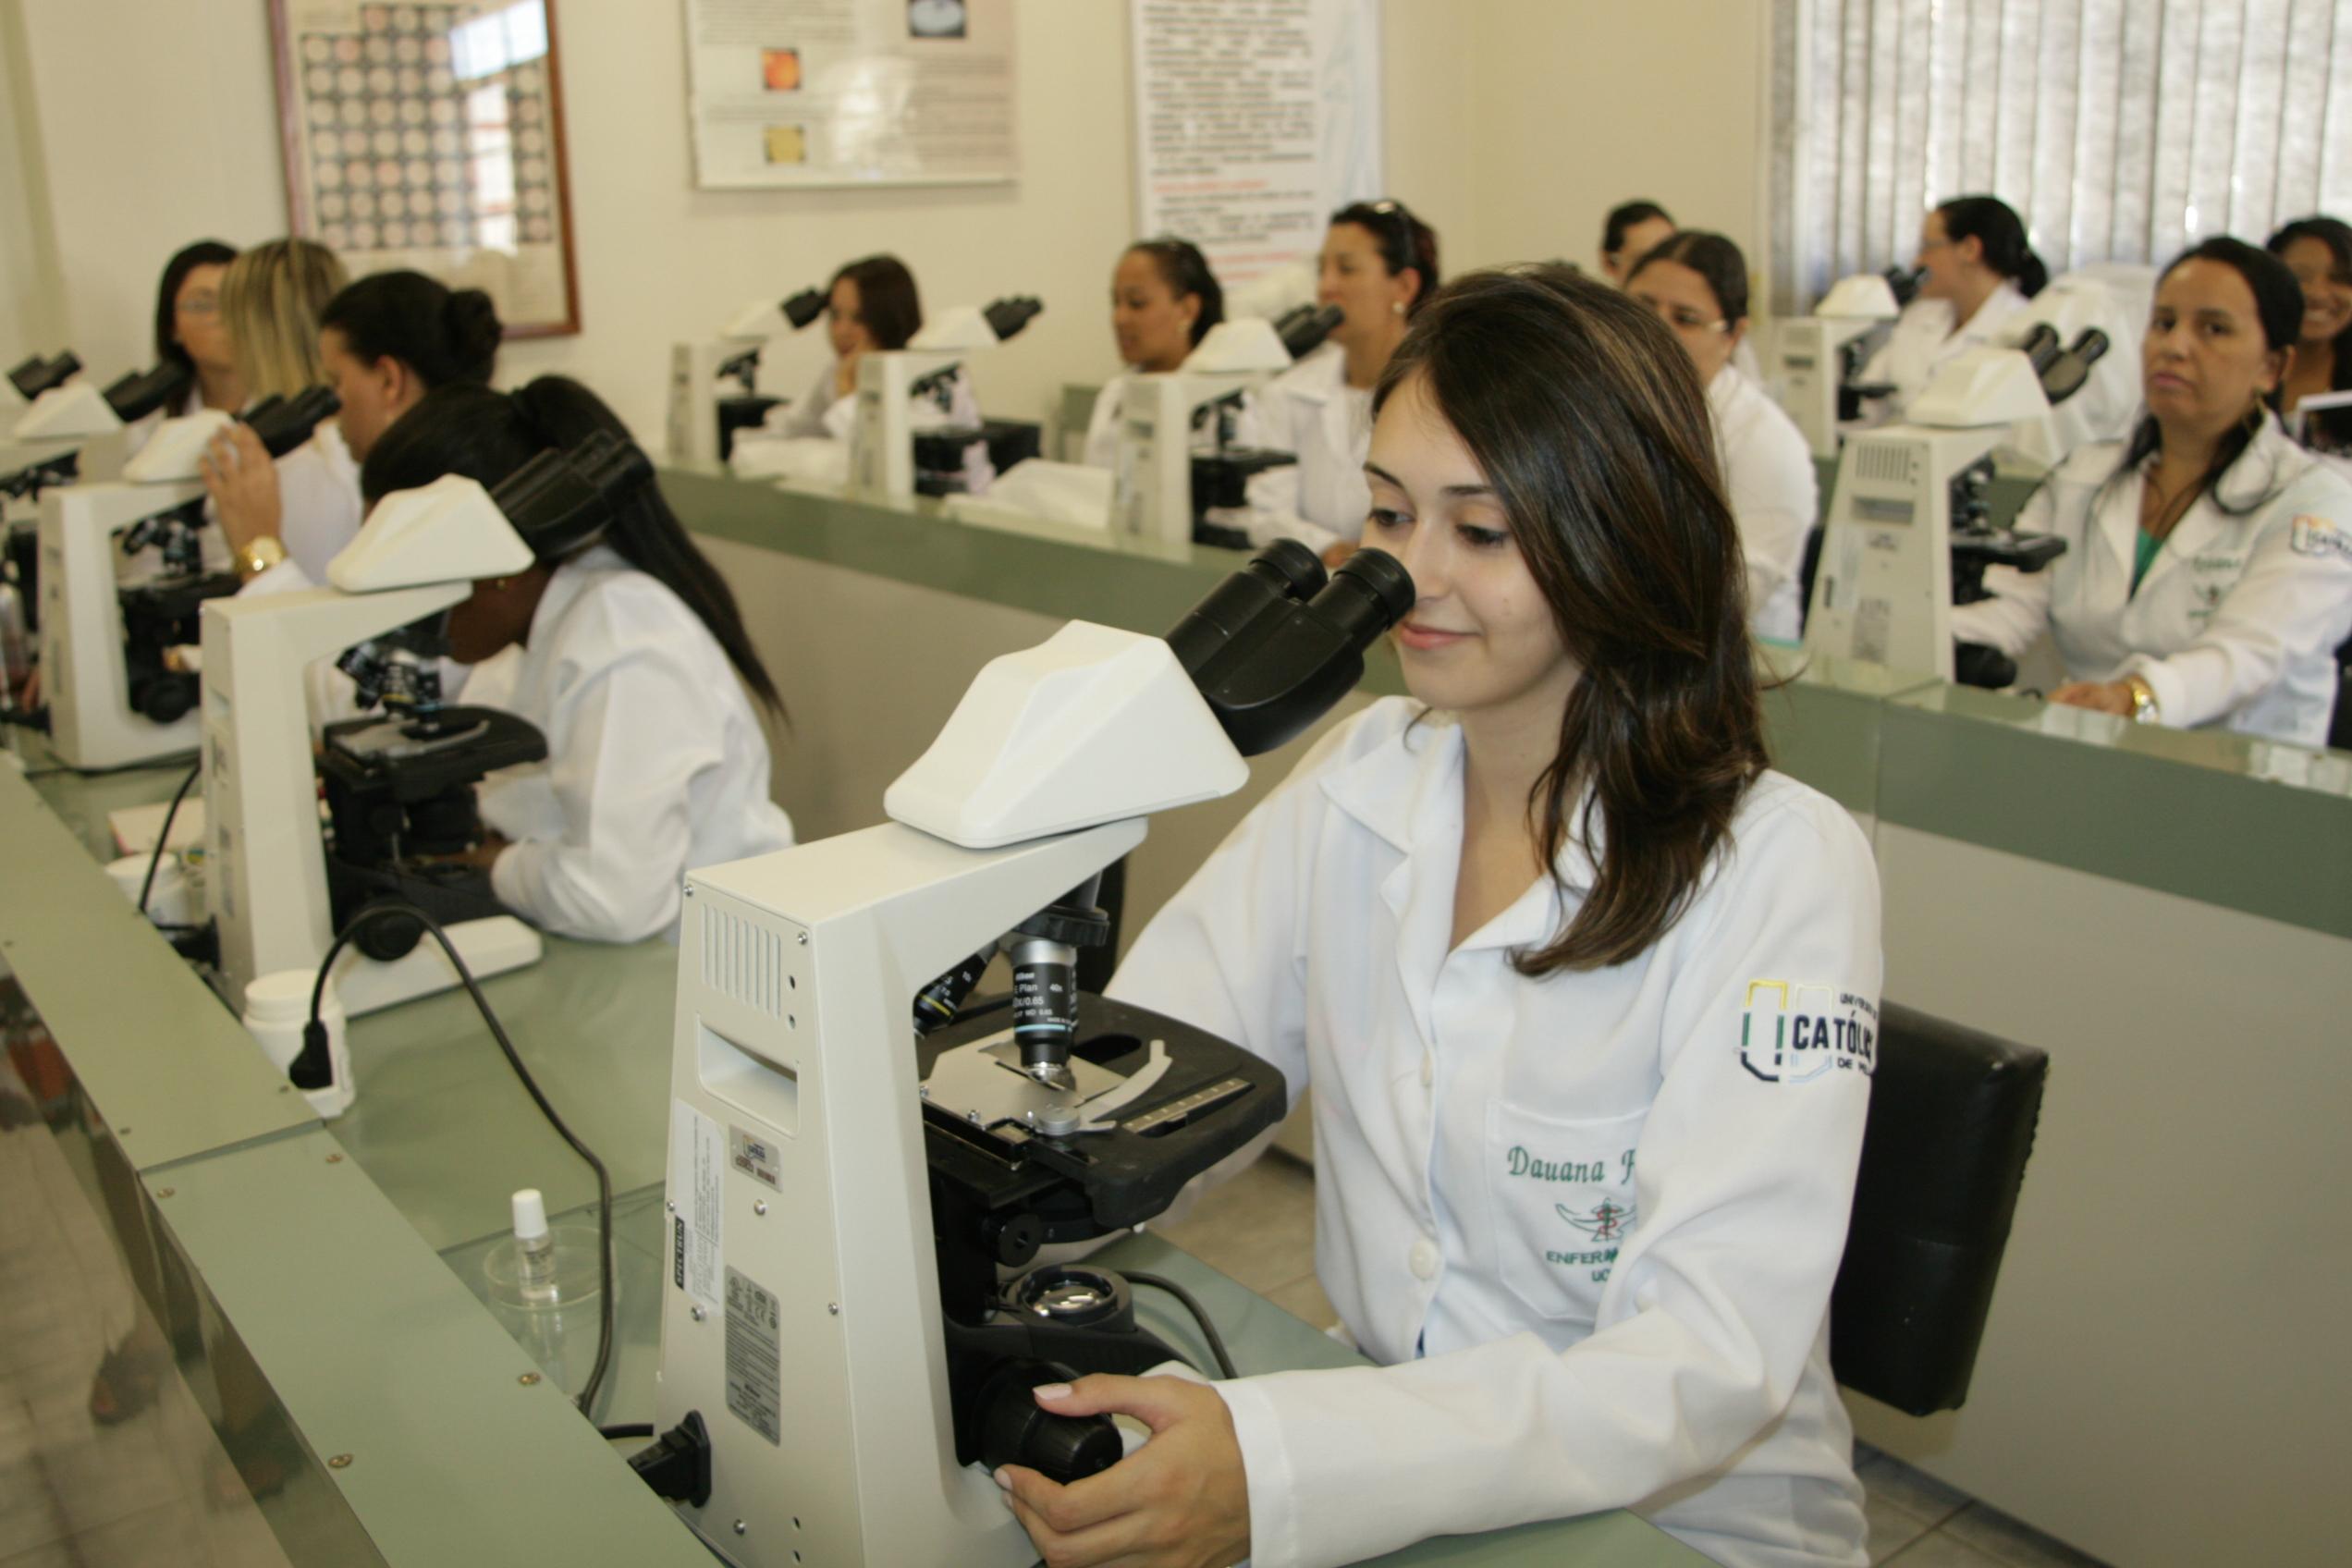 microscópios-sendo-testados-com-novos-alunos